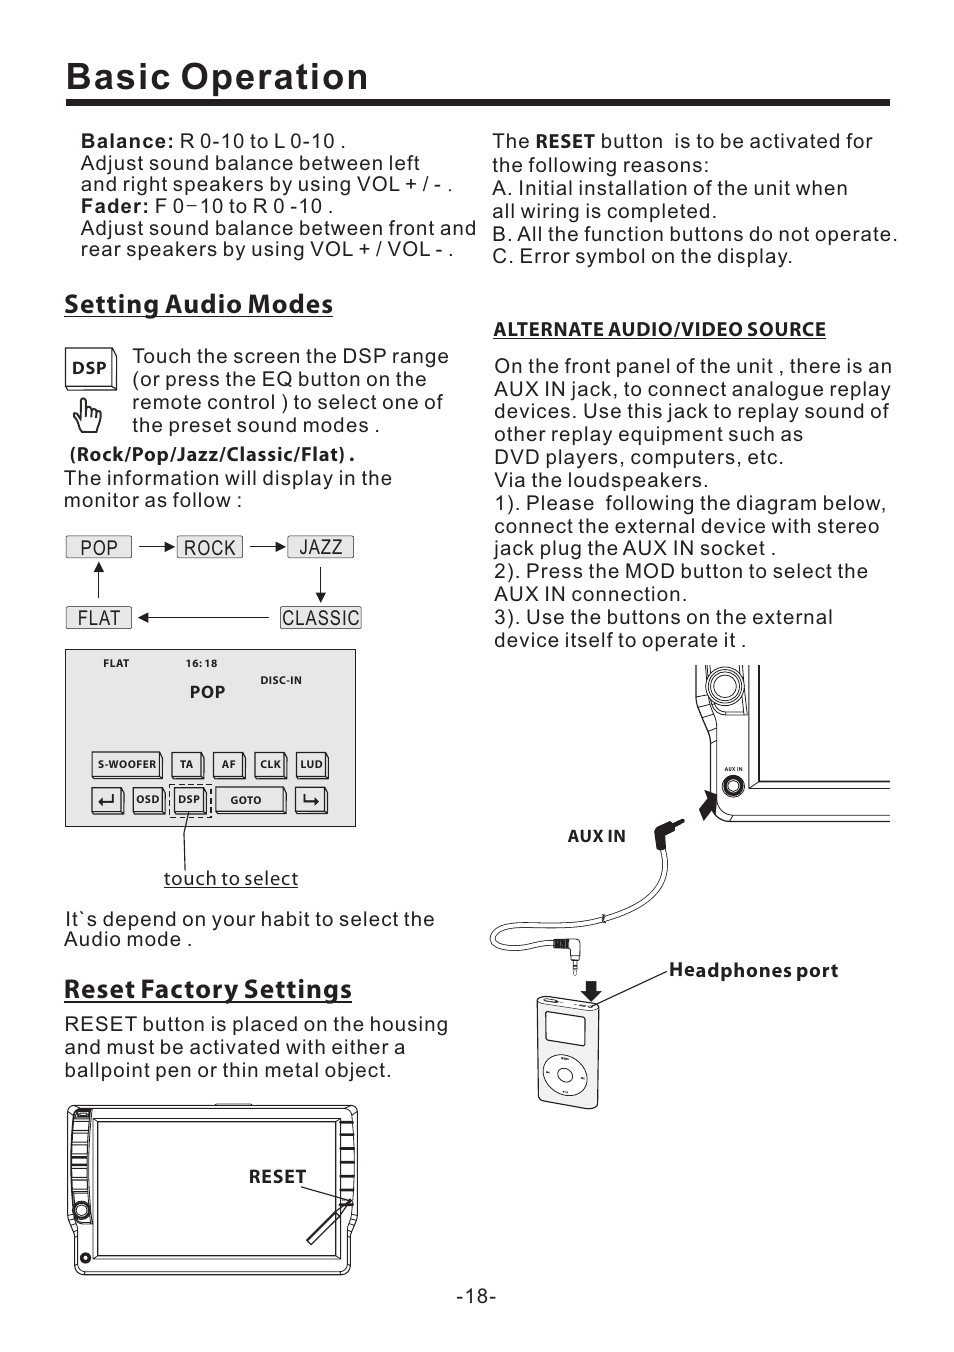 Wiring Diagram For Pyle Pld71mu Diagrams Data Base Radio Basic Operation Setting Audio Modes Reset Factory Settings Rh Manualsdir Com On Weldex